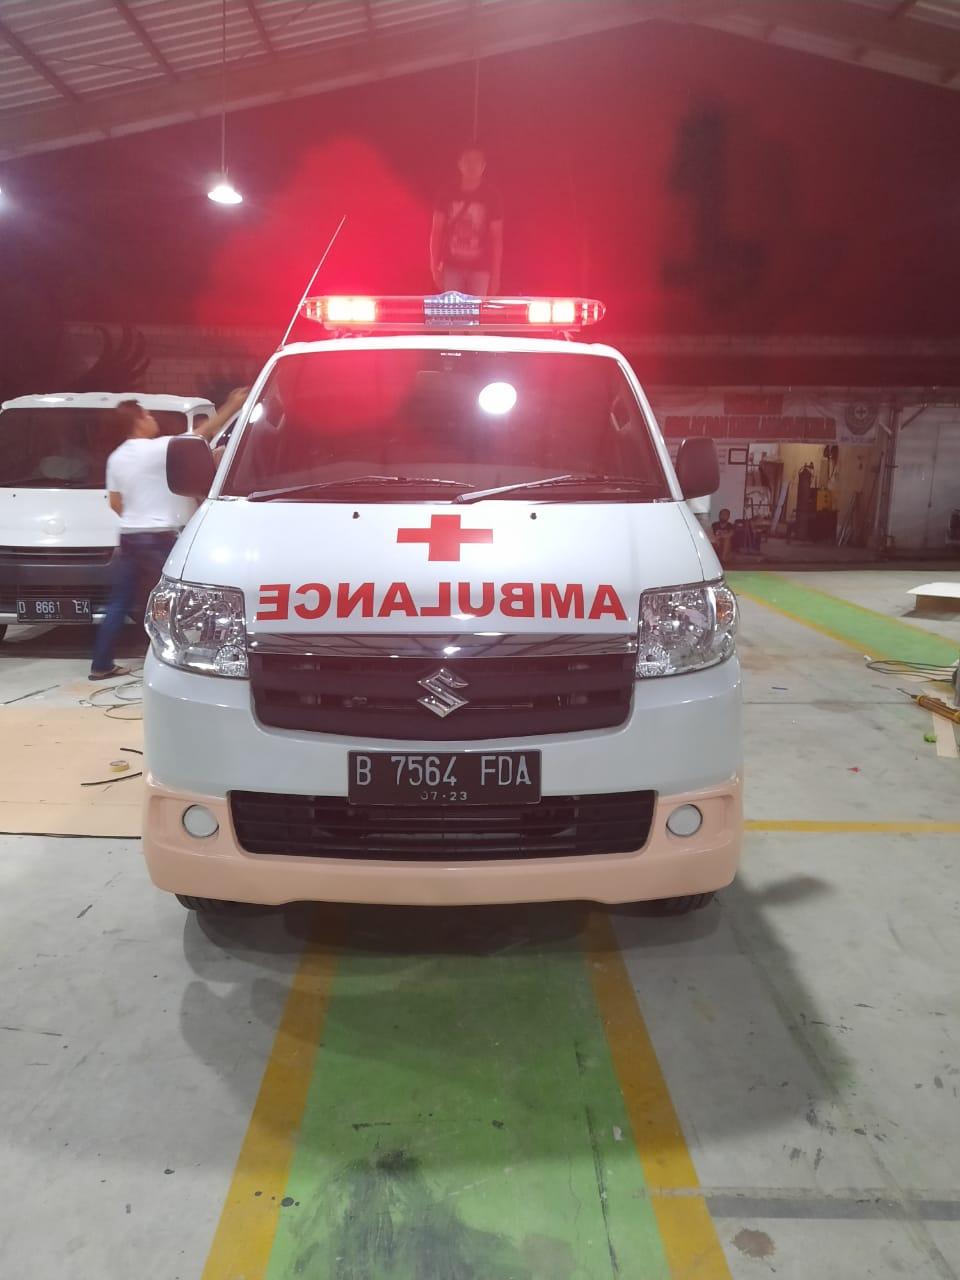 Suzuki APV Laris Manis Ditengah Pandemi, Ternyata Cocok Buat Ambulan